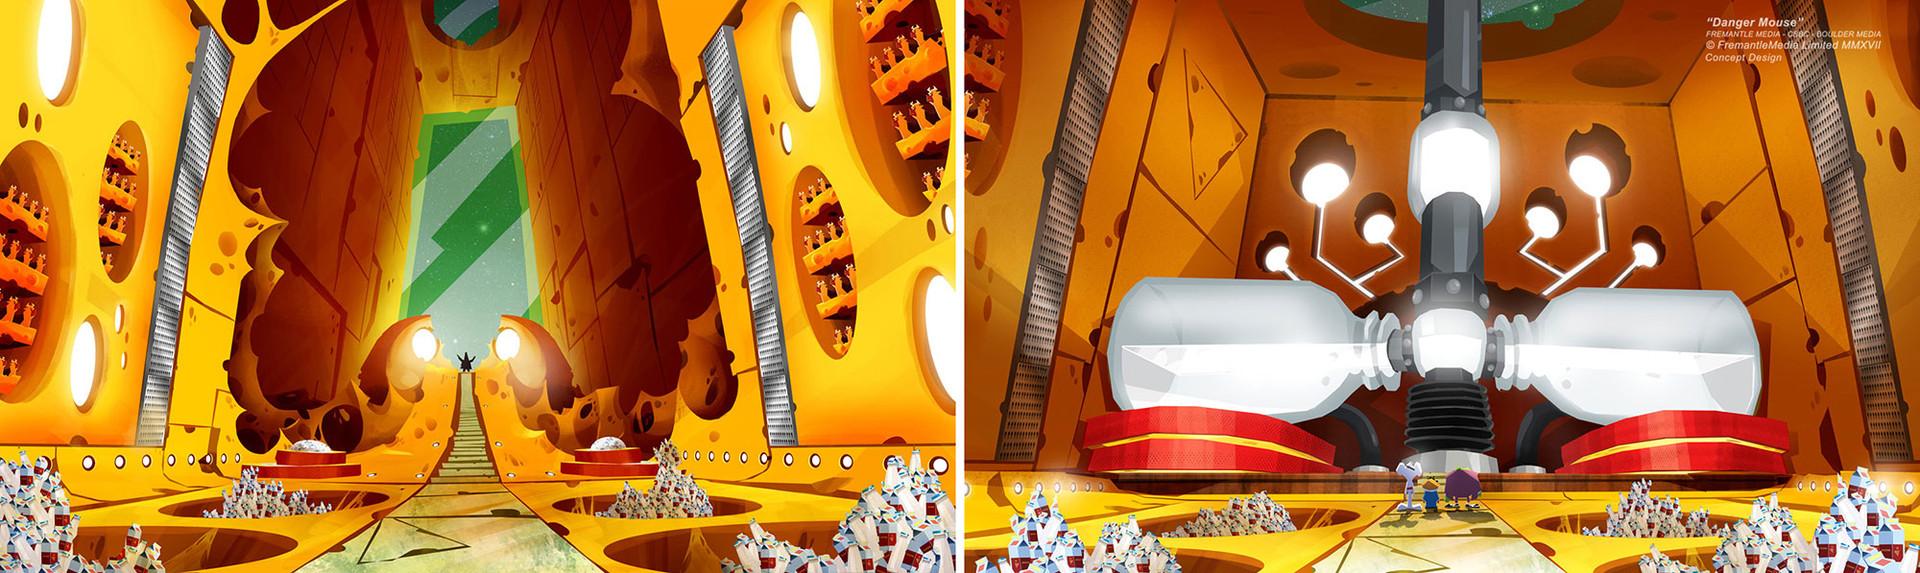 Danger Mouse - Concept Design - Cheese Spacecraft